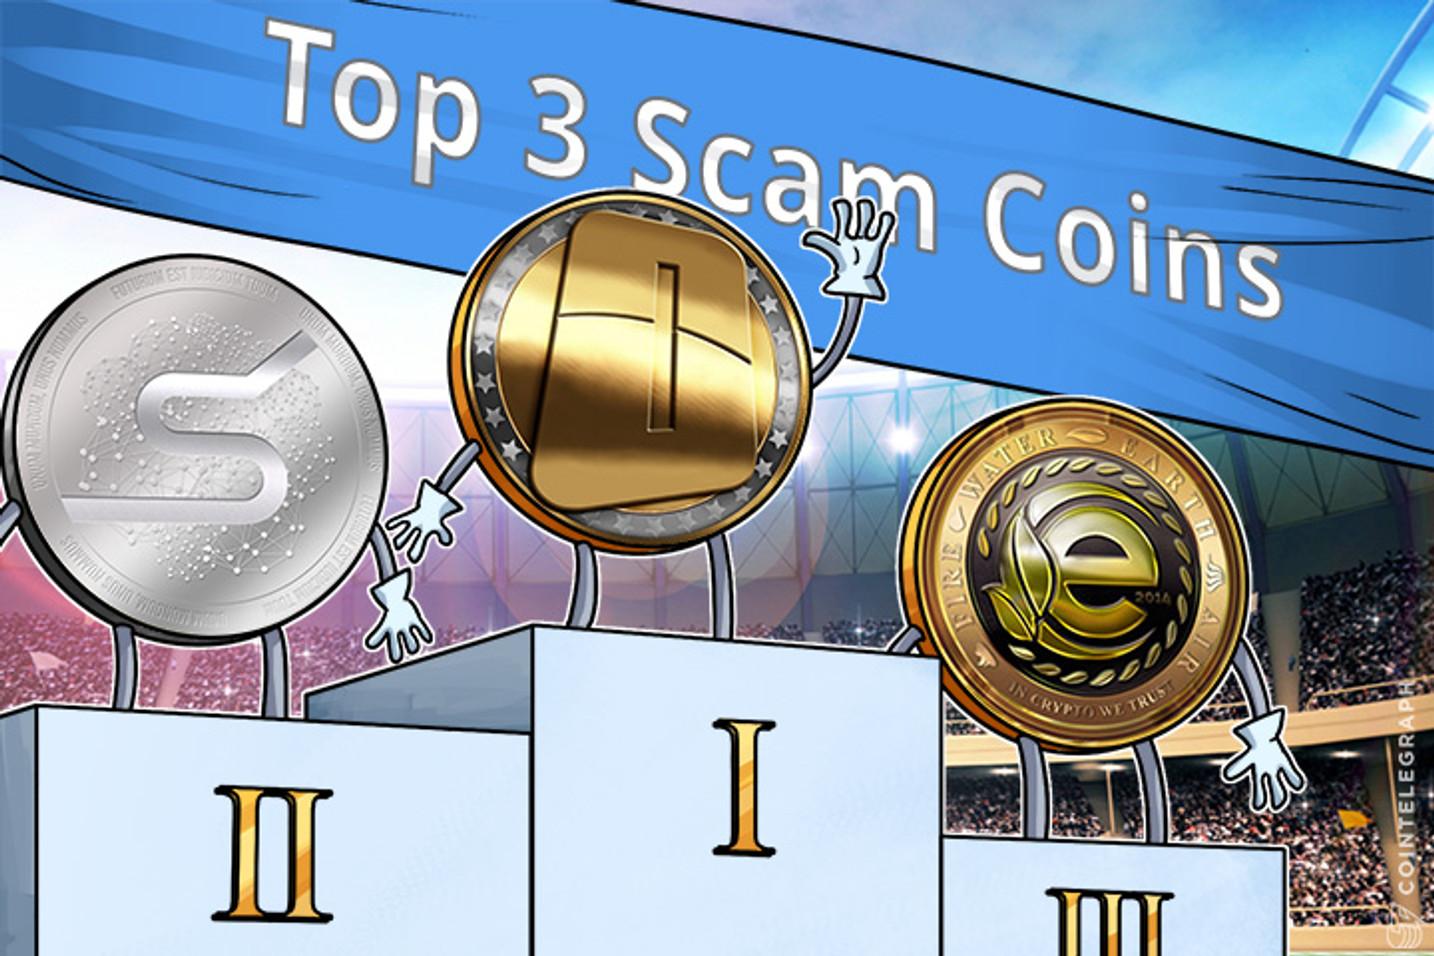 OneCoin Leads Top 3 Scam Coins List, S-Coin, EarthCoin Follow